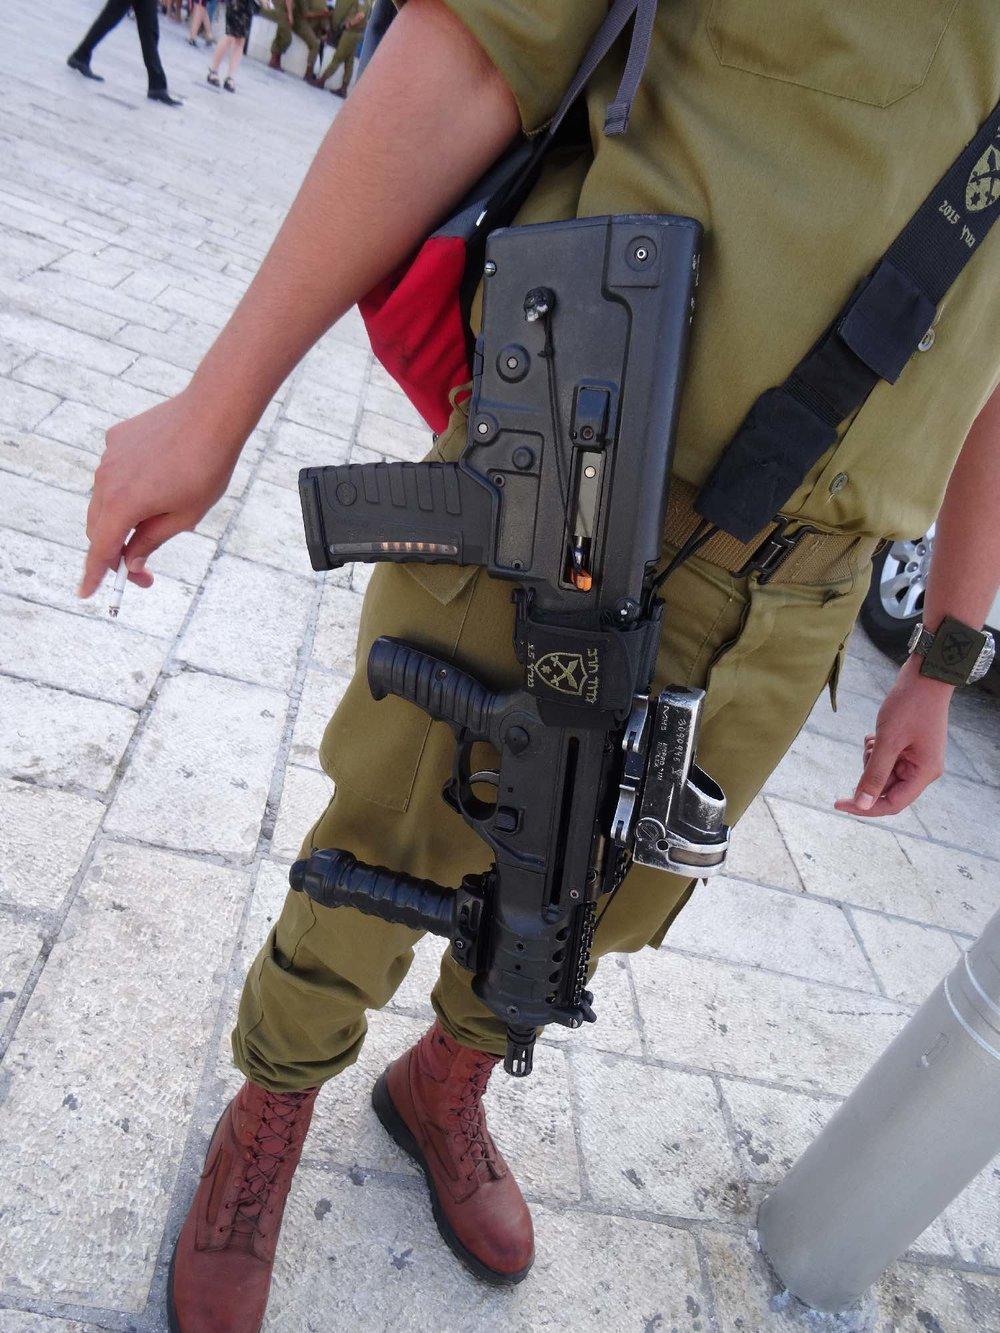 Jerusalem old city | Israeli army | Machine gun | photo sandrine cohen